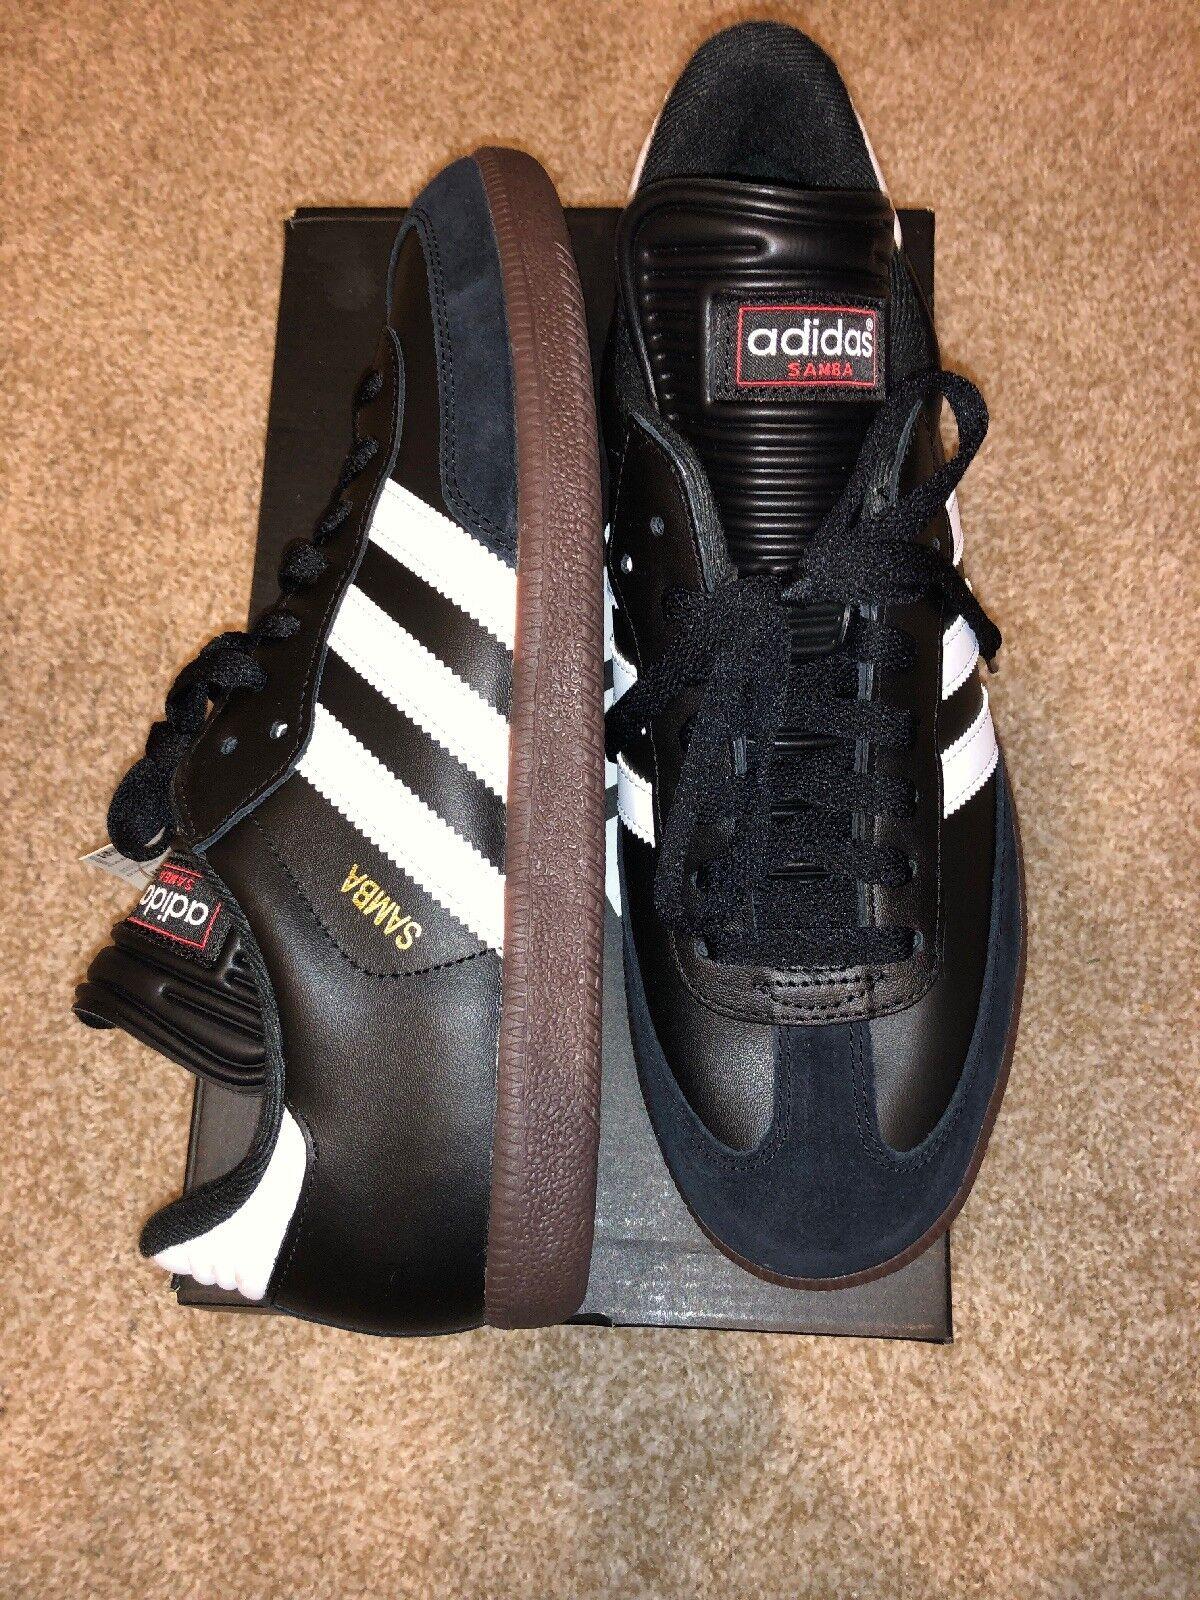 Adidas Samba Classic Sz. 9.5